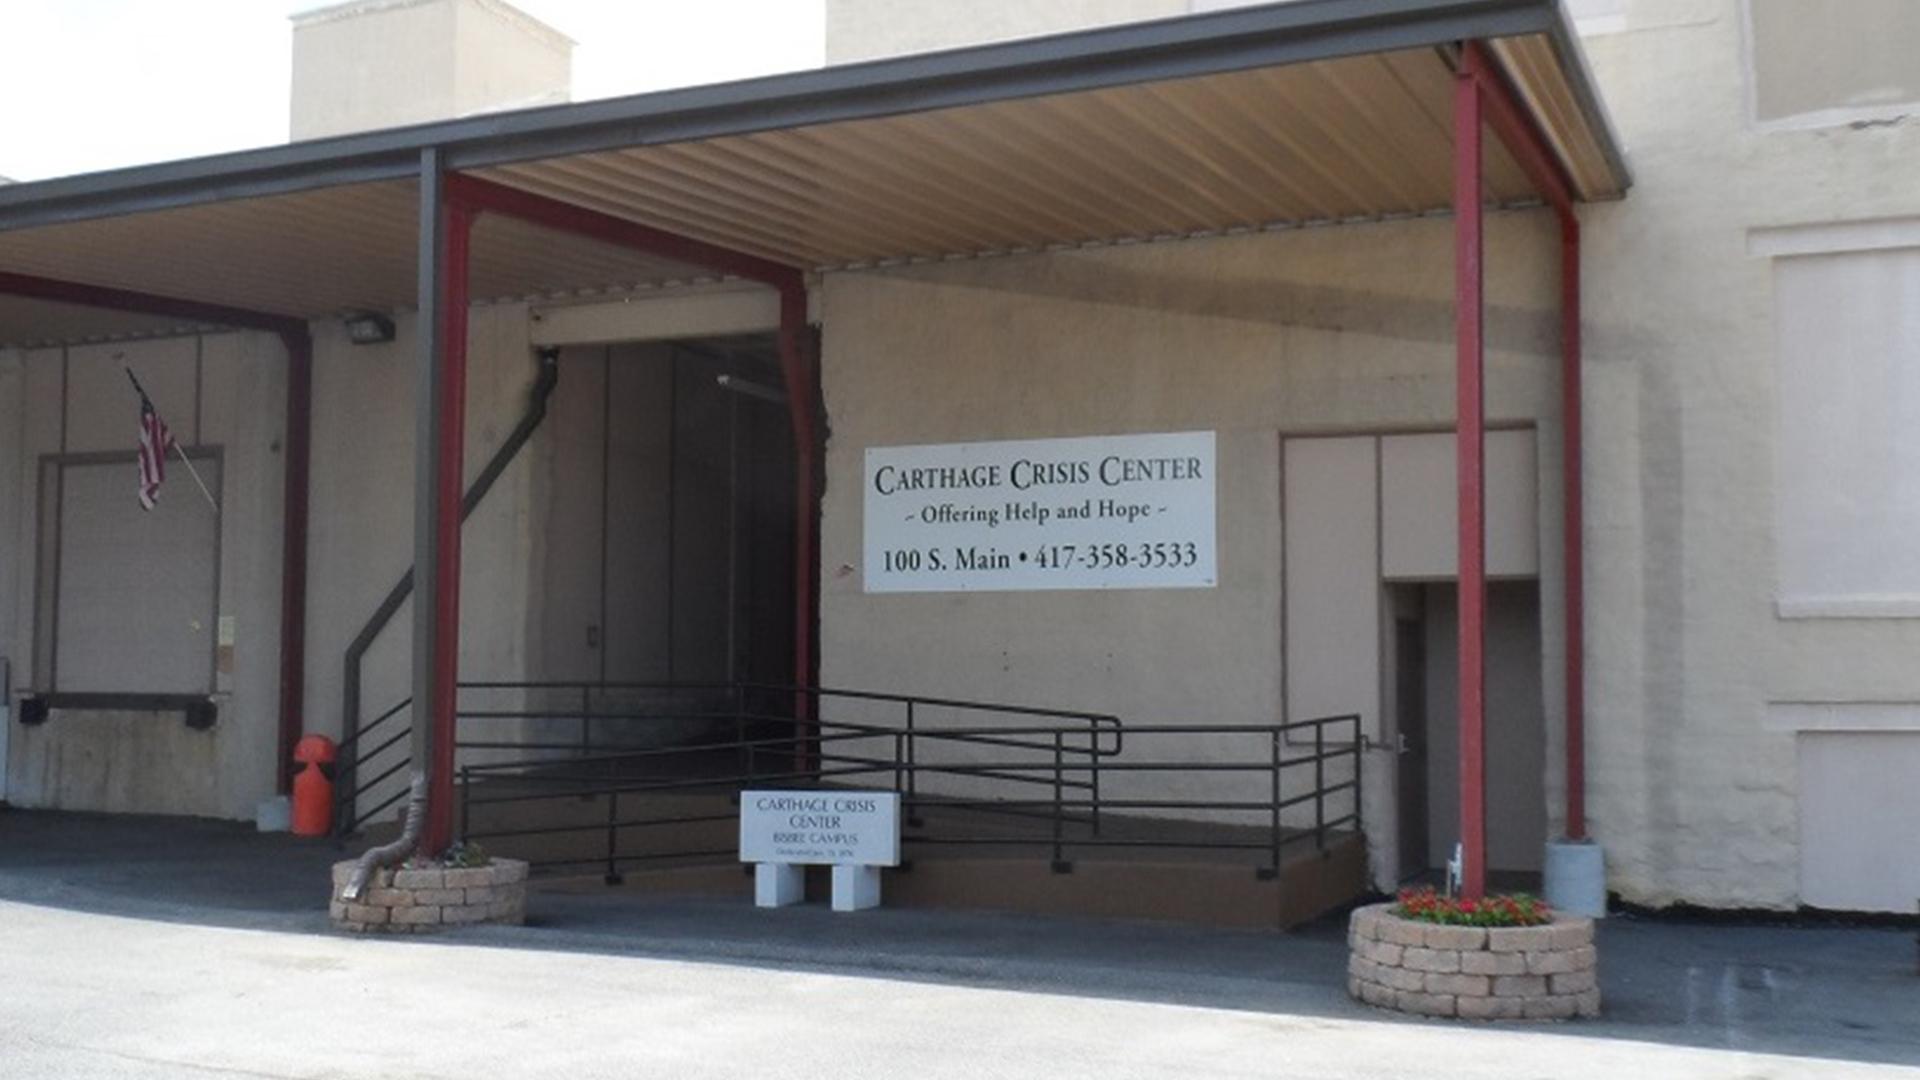 Carthage Crisis Center - Faith-based homeless center, recycling center, food distribution center.